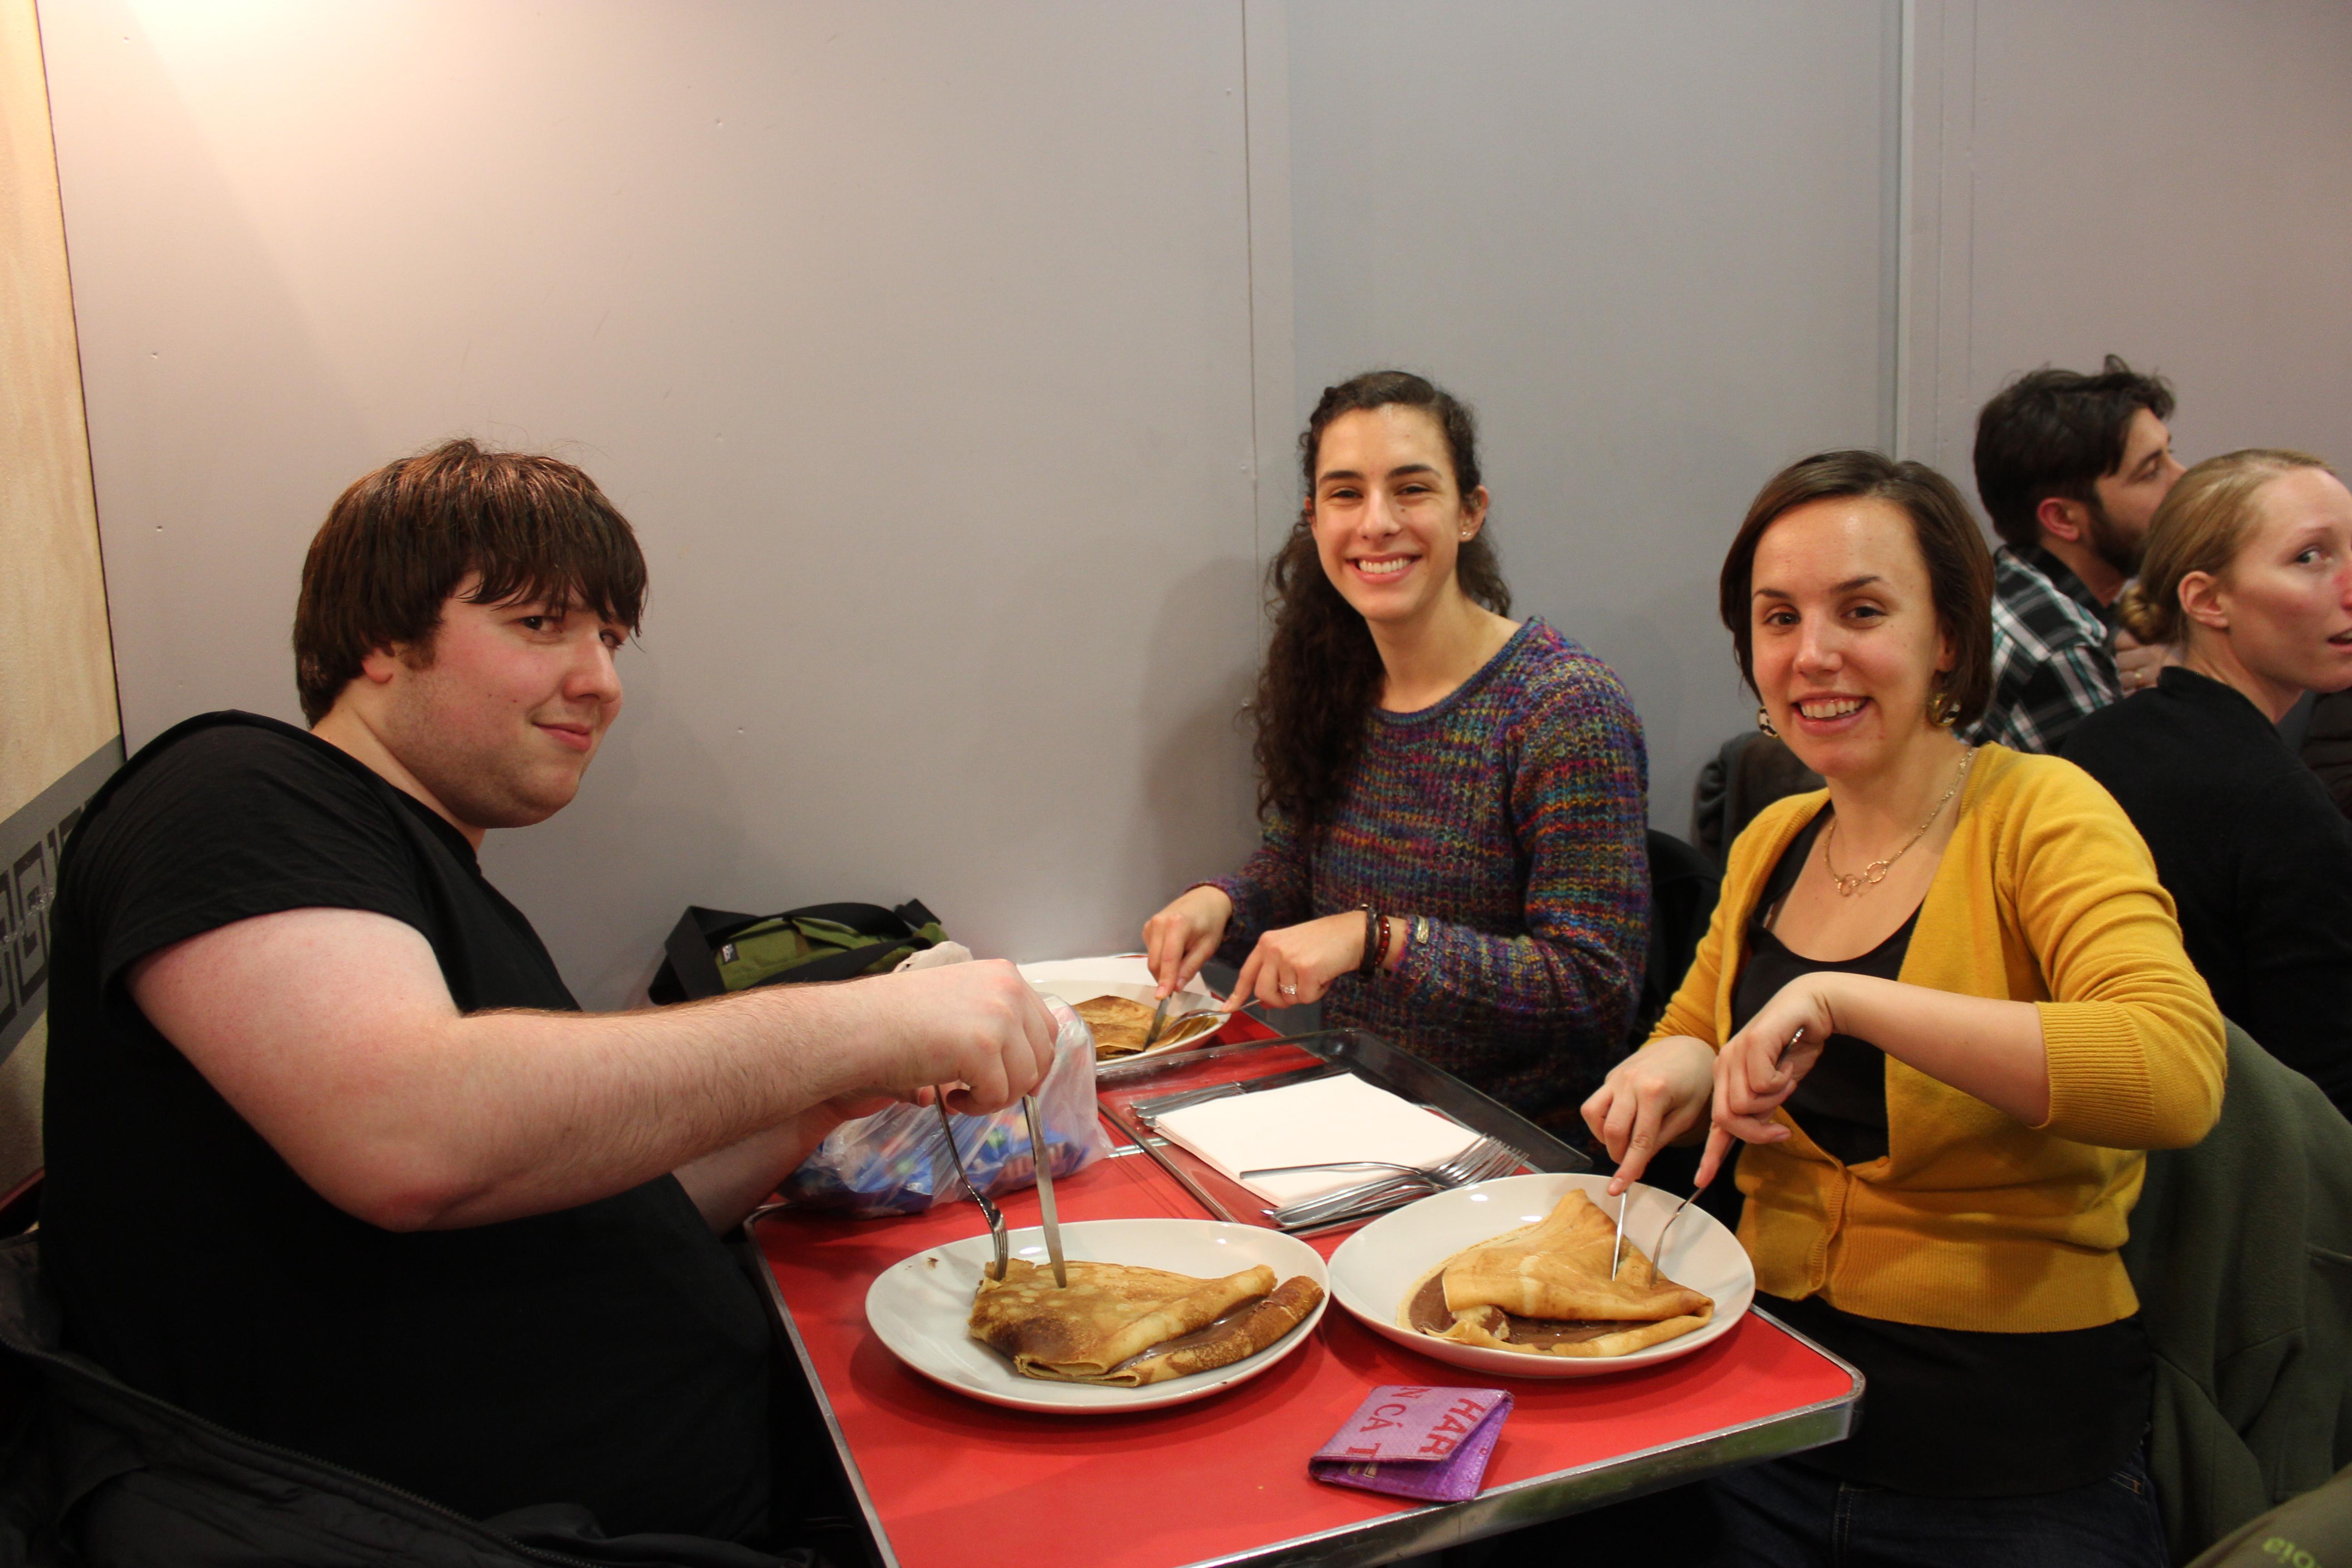 Junior Brandon Sher, sophomore Maggie Myers, and senior Amber Slater enjoy some giant crepes.